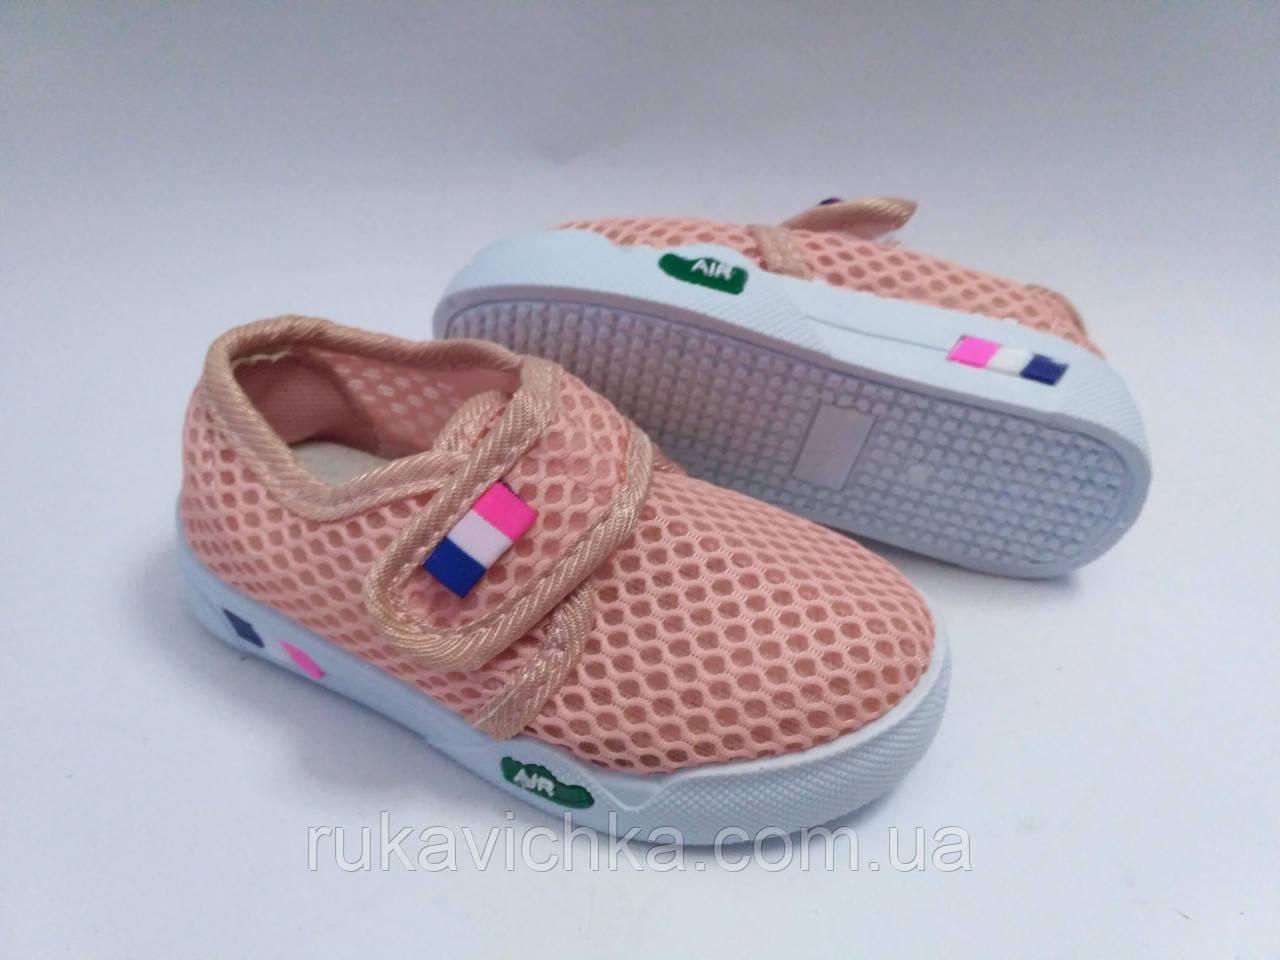 3297fe2d Летние тапочки кеды на липучке для девочки бренда Jong Golf (Vesnoe), р.